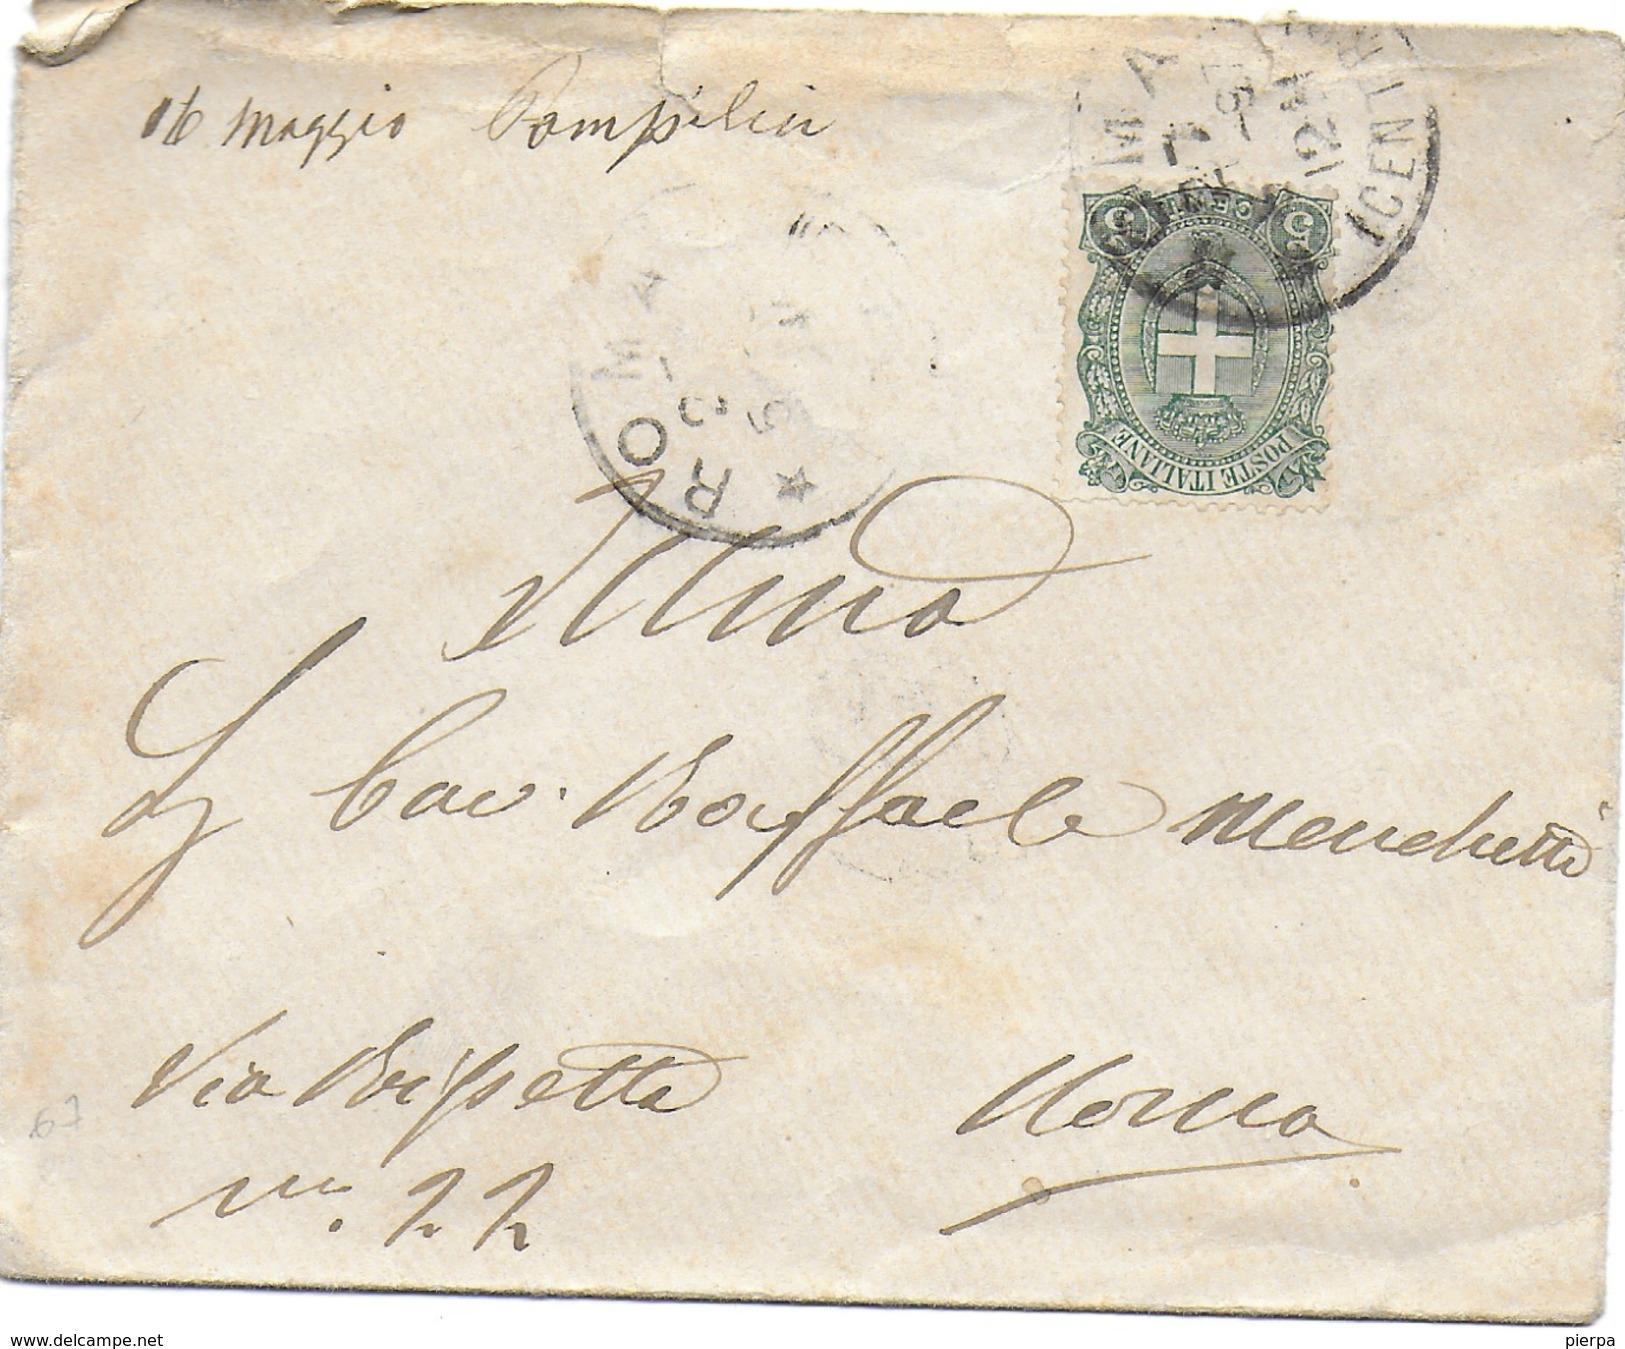 STORIA POSTALE REGNO - UMBERTO I°- BUSTINA DA ROMA 1897 - Storia Postale